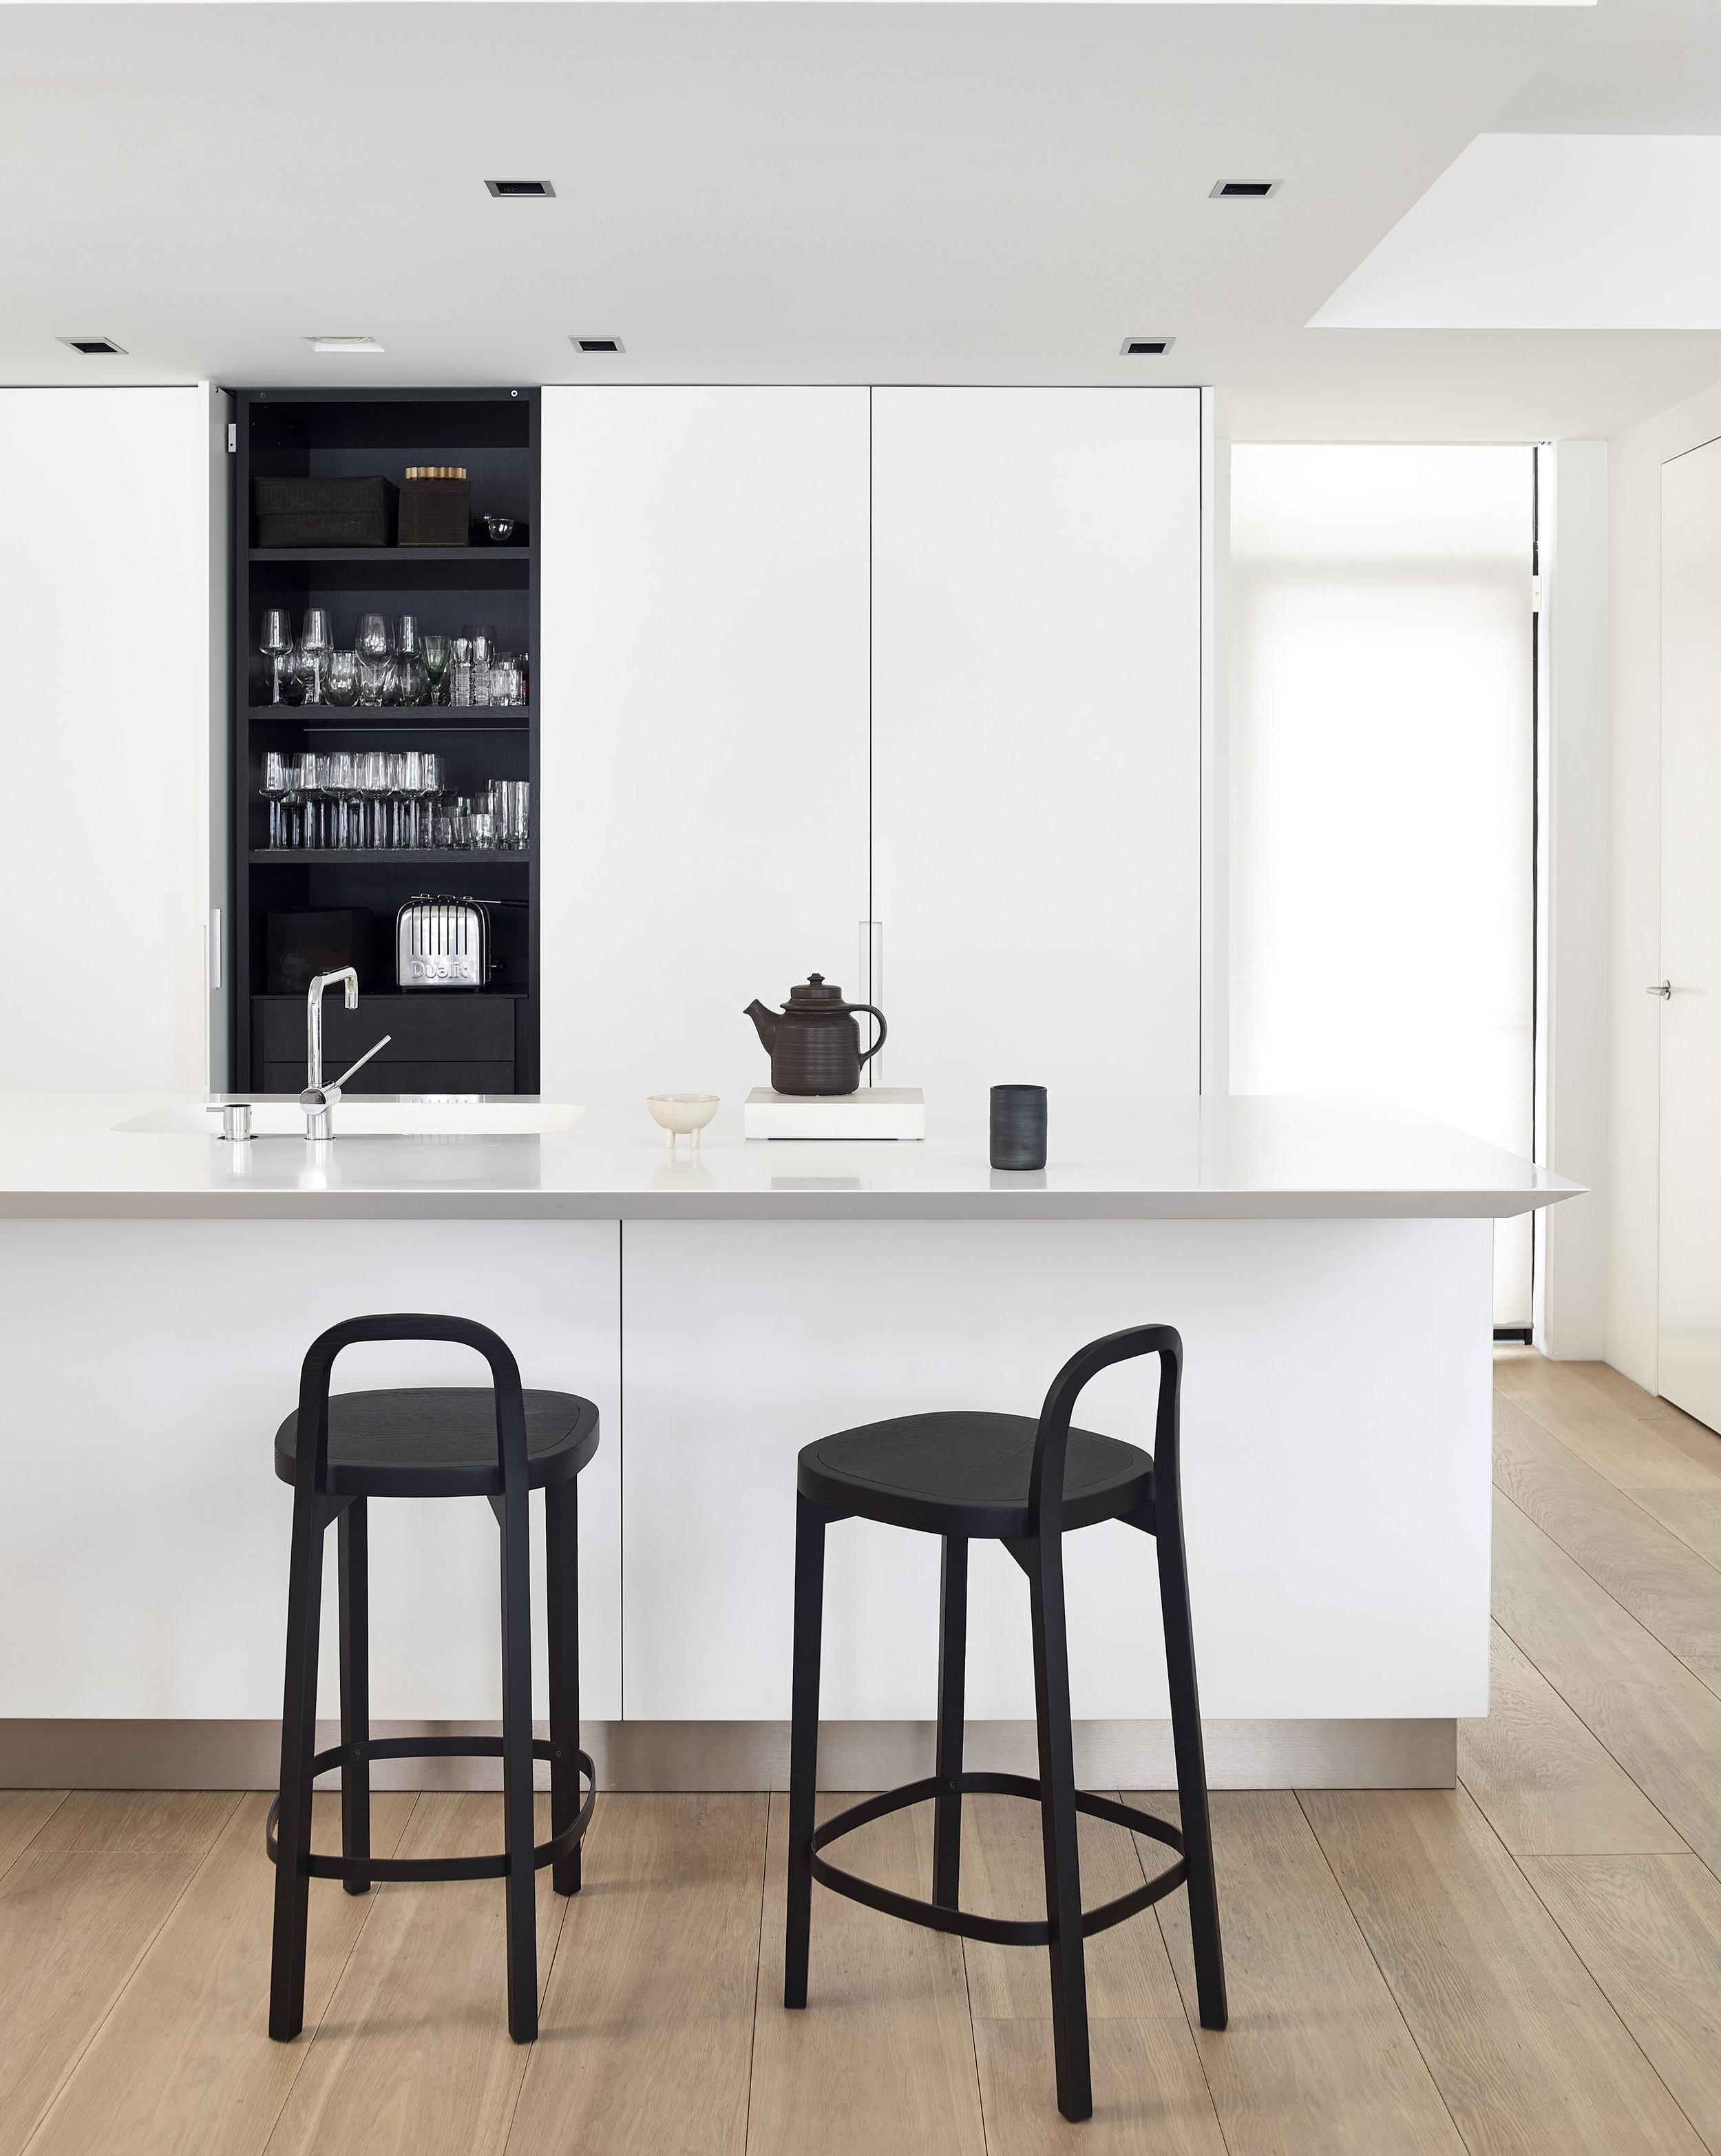 Siro+ bar stool height 65 cm in black